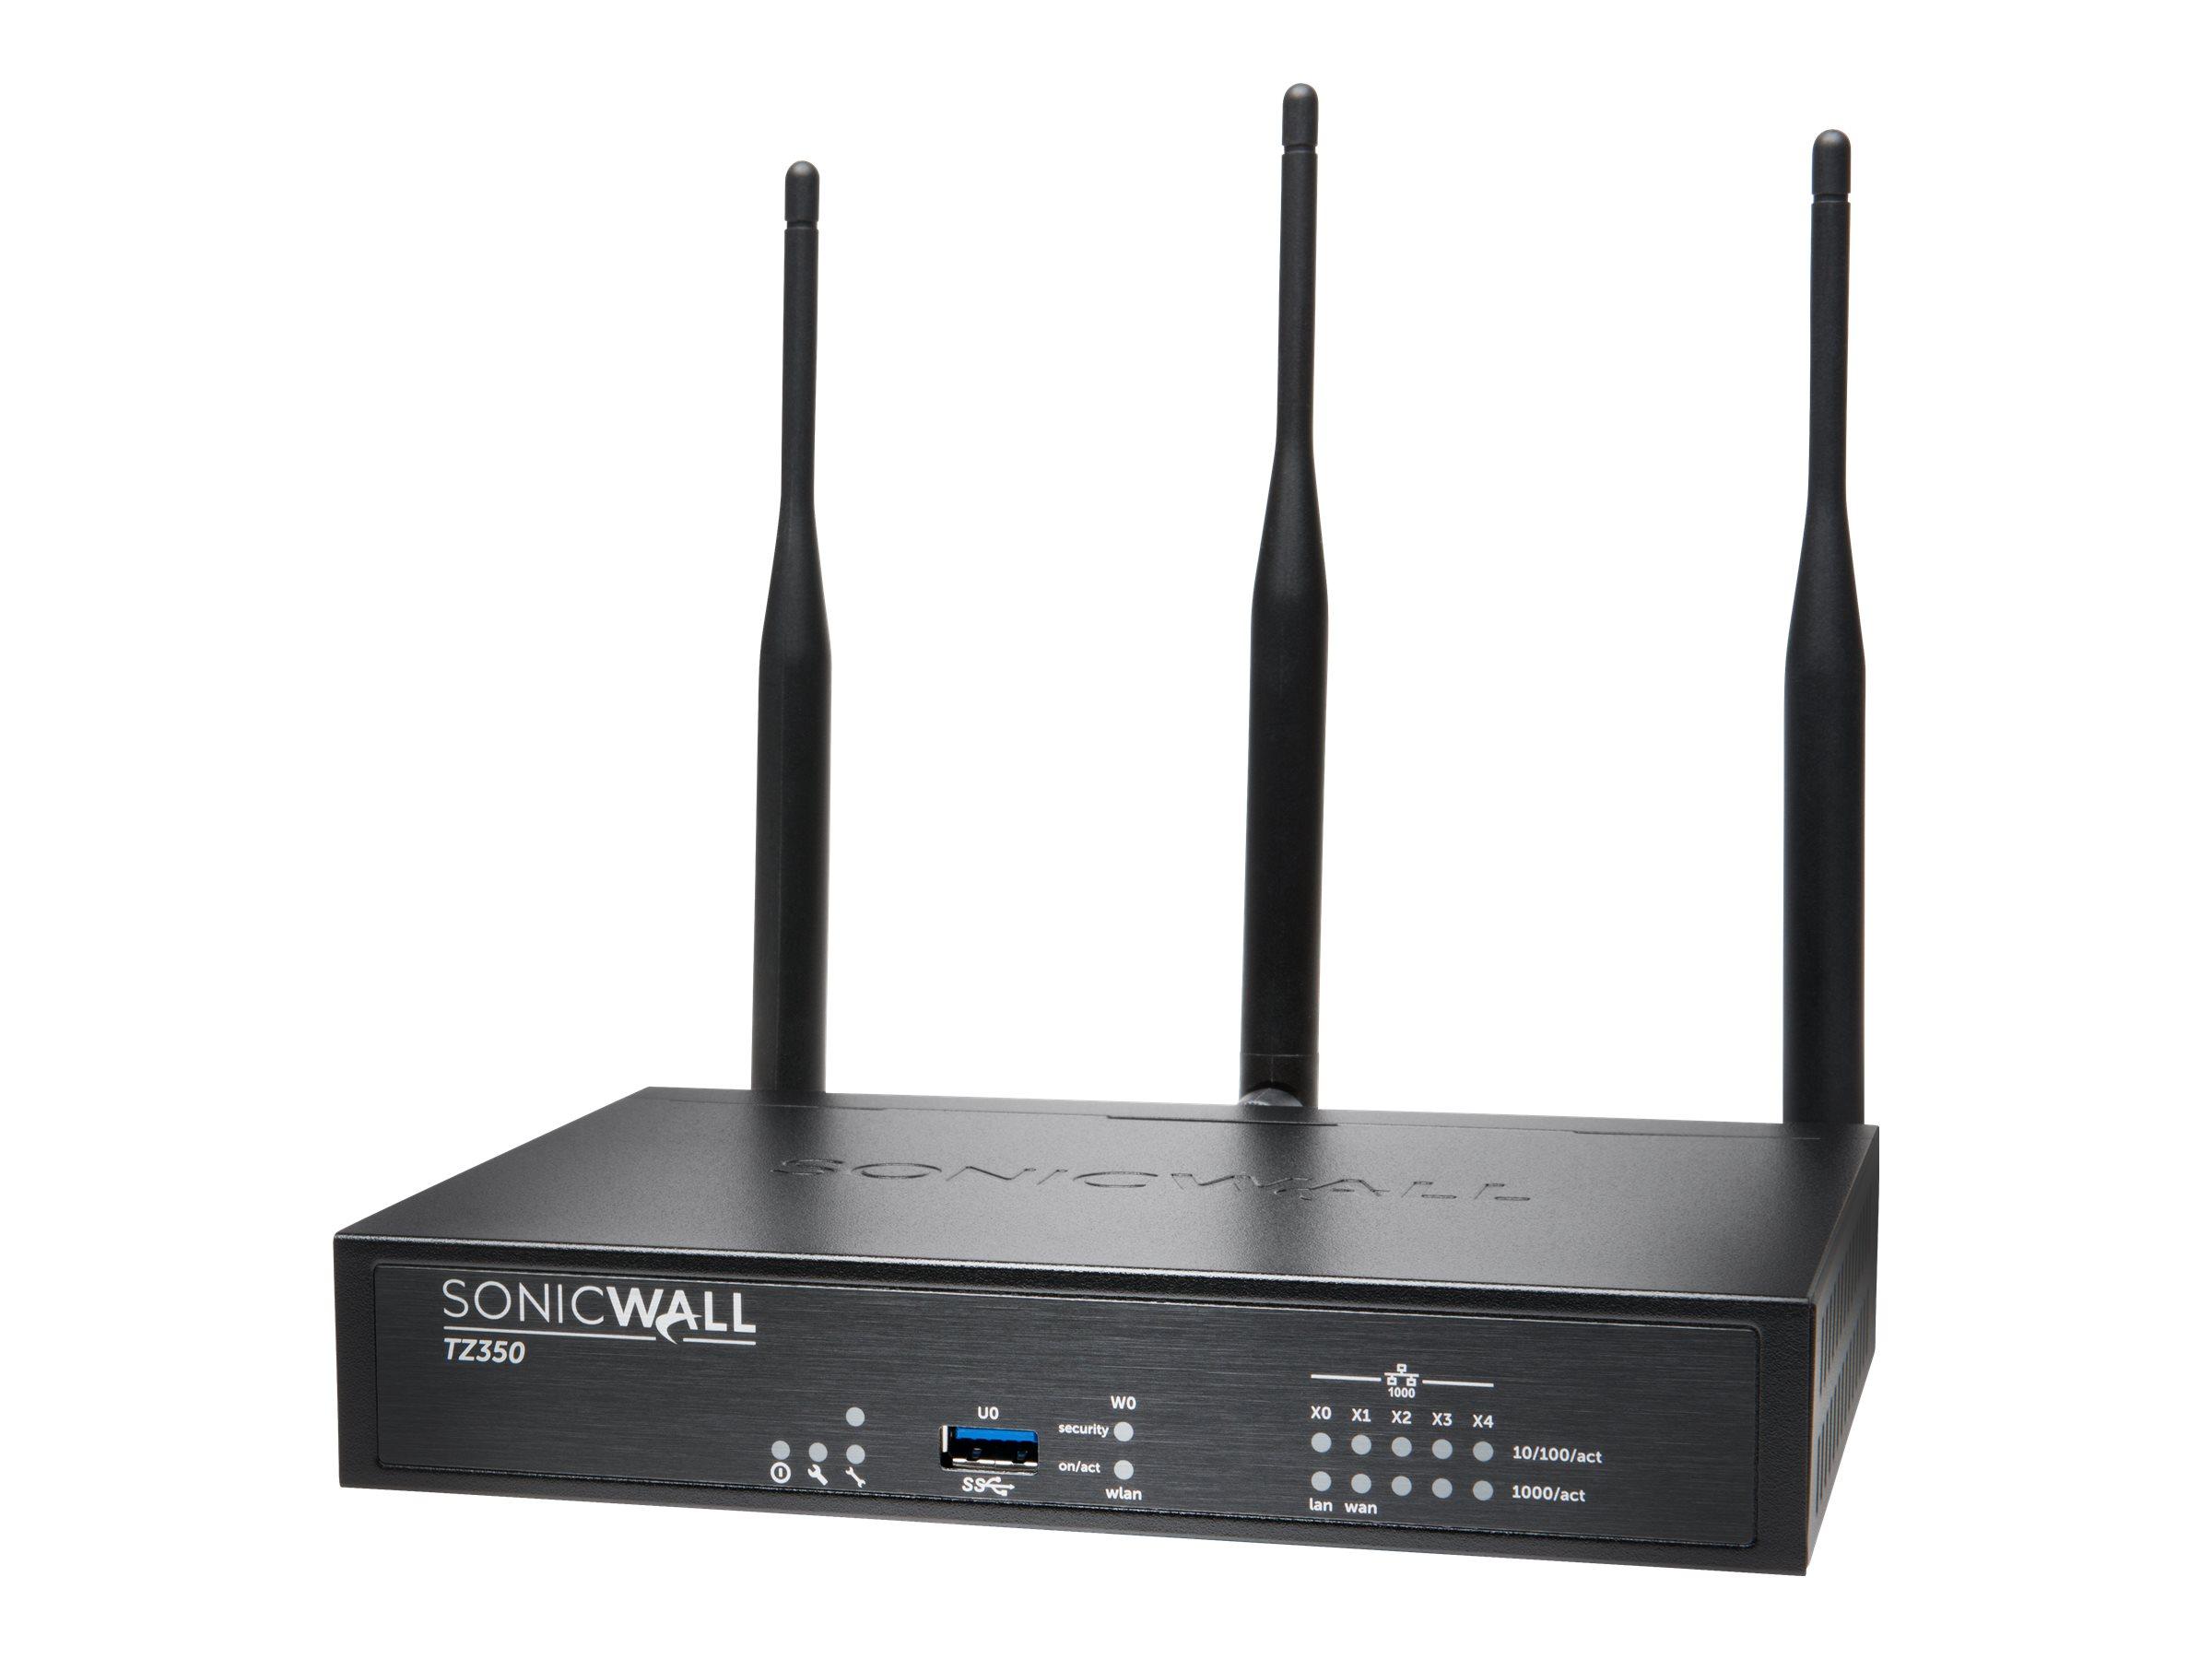 SonicWall TZ350 Wireless-AC - security appliance